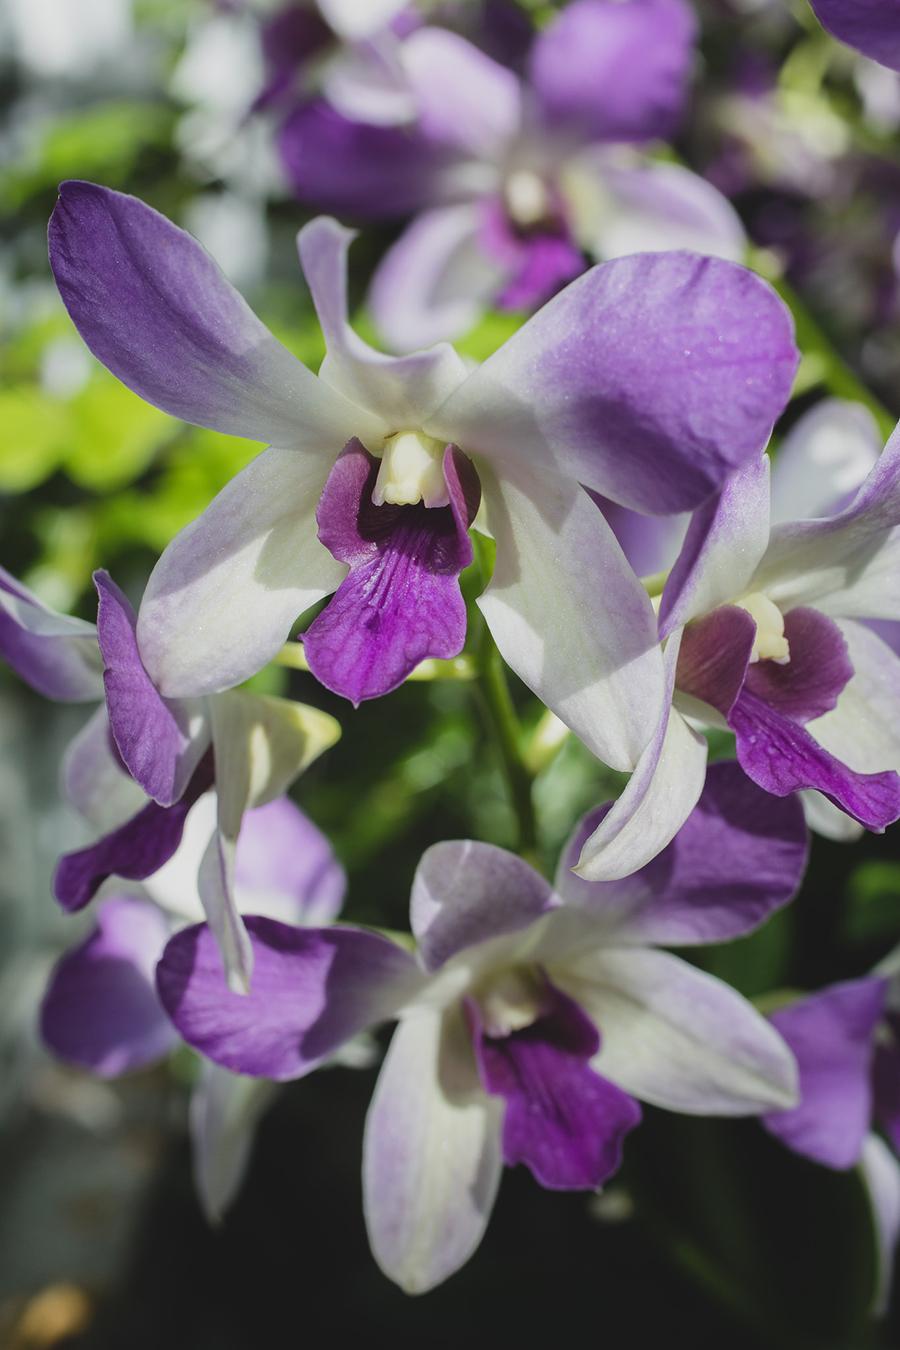 Orchid Art Print - april bern photography